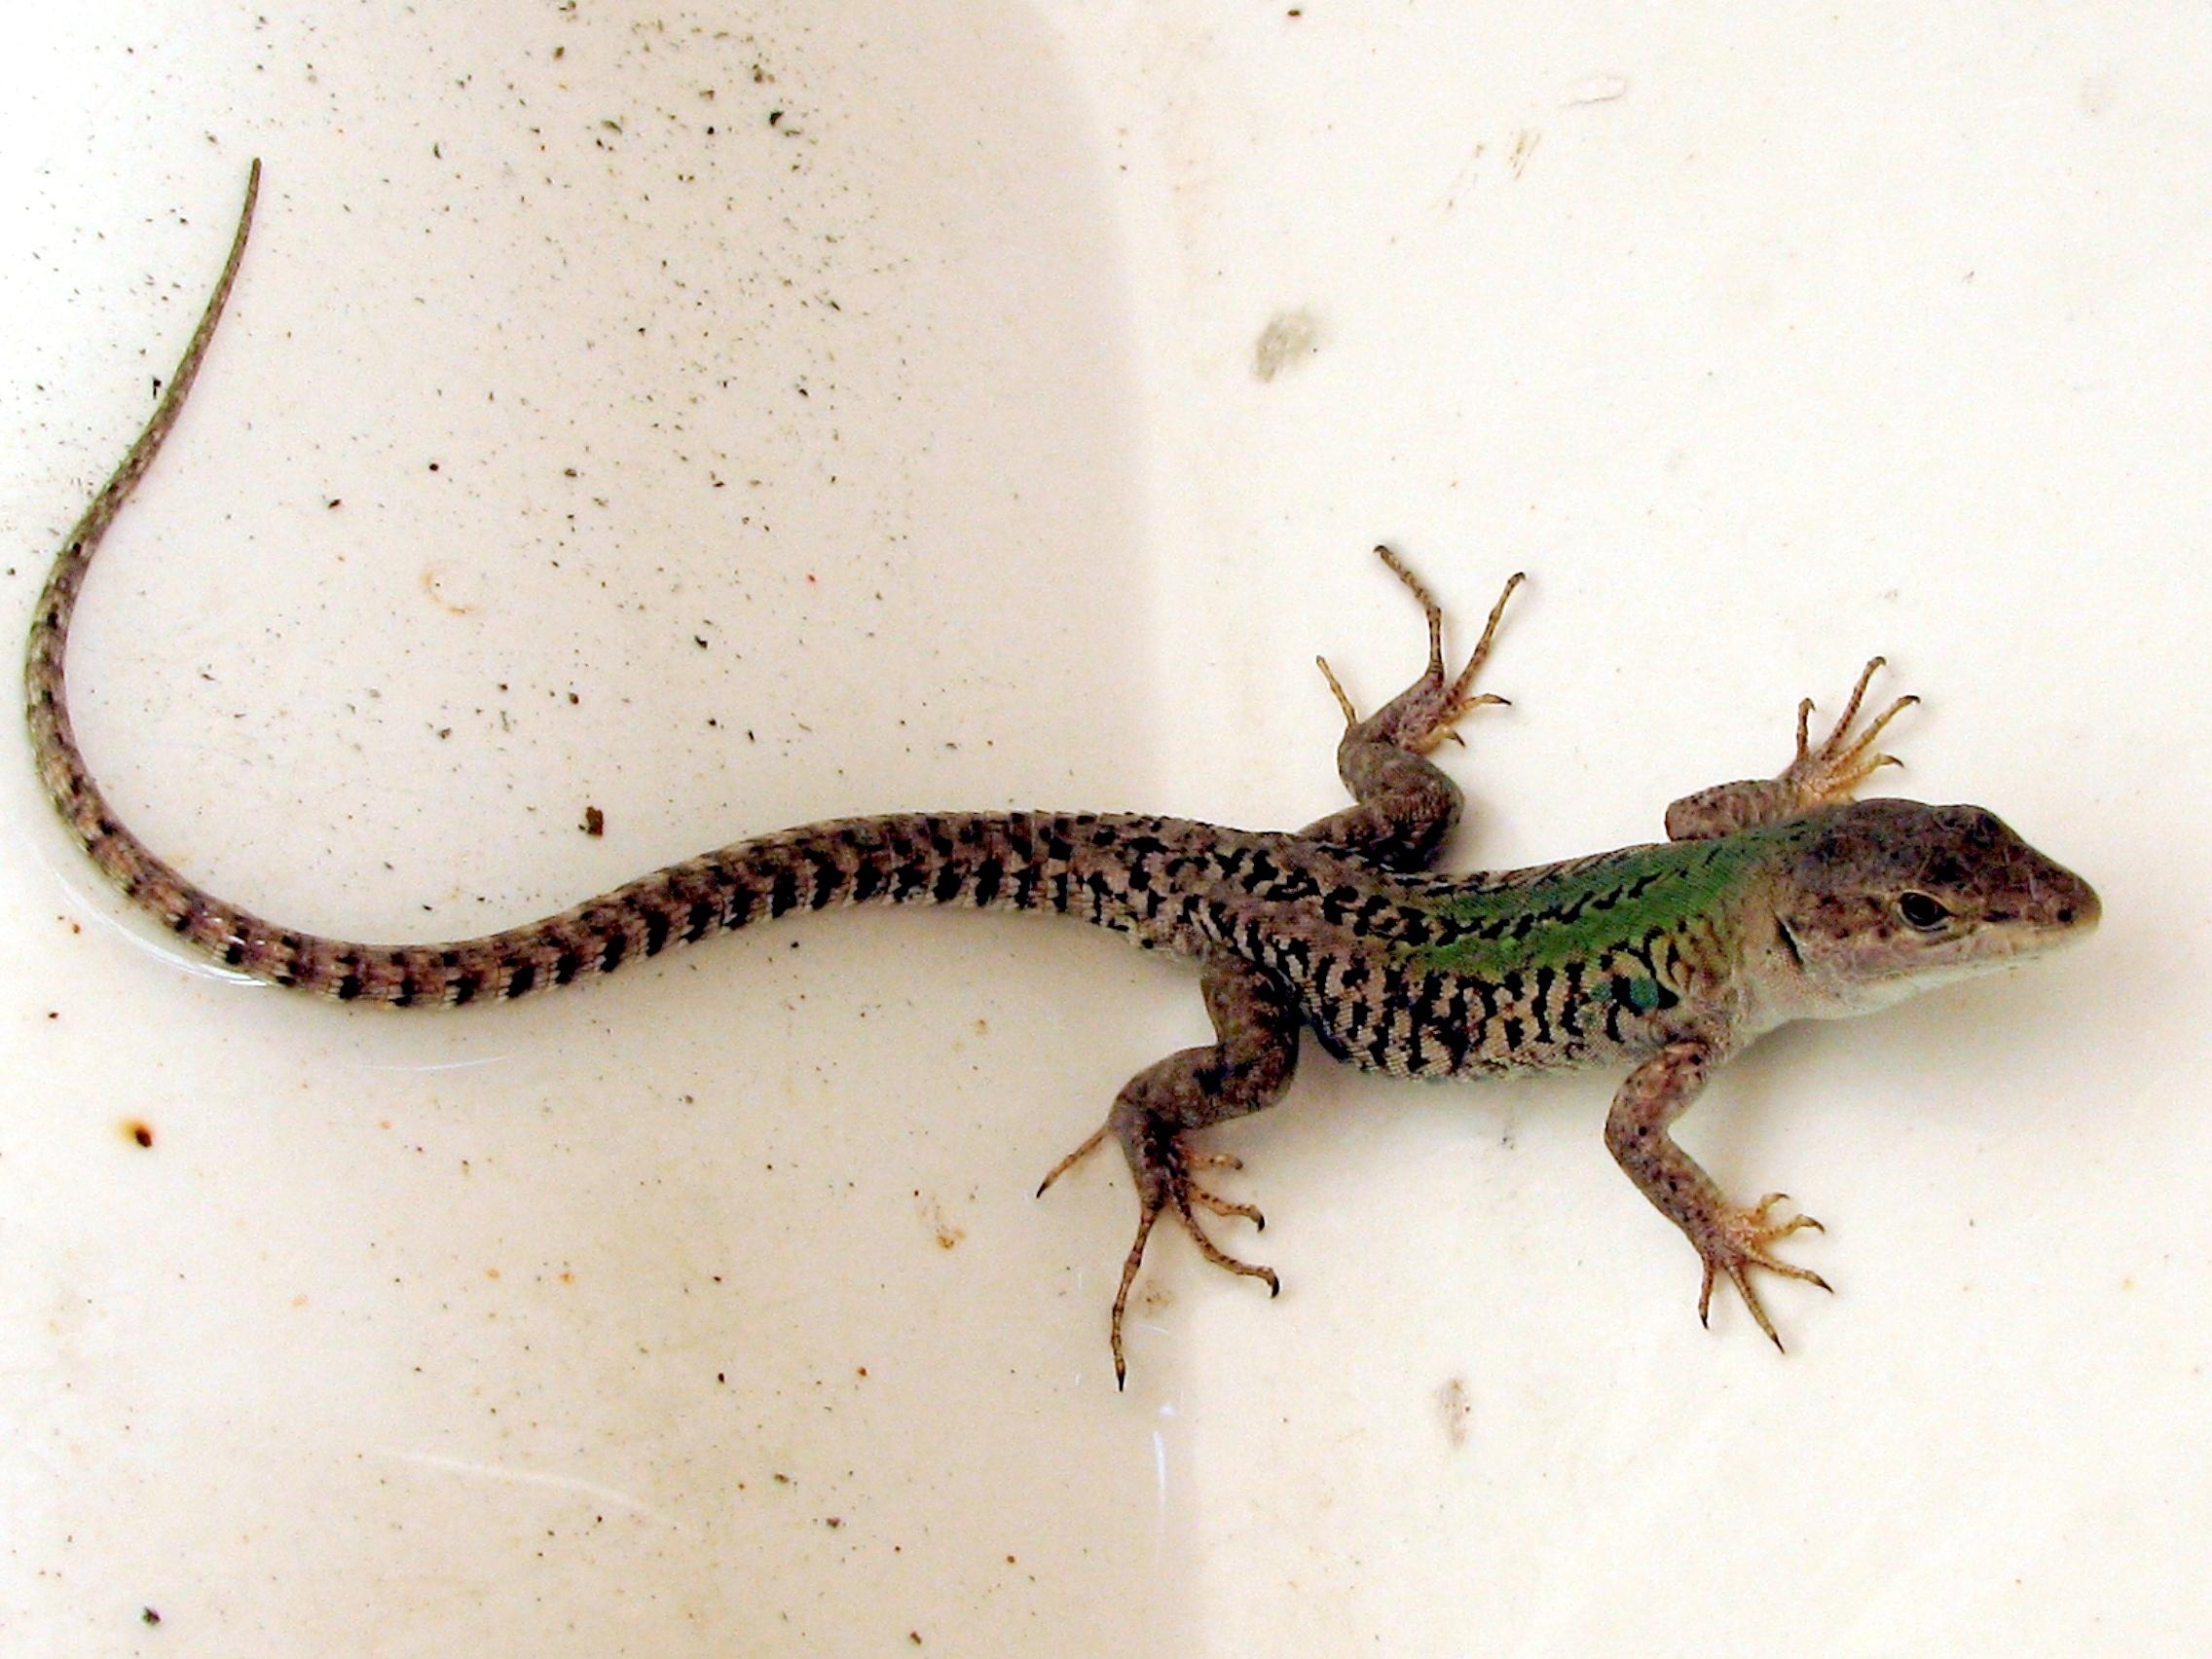 Italian Wall Lizard Natural Selection